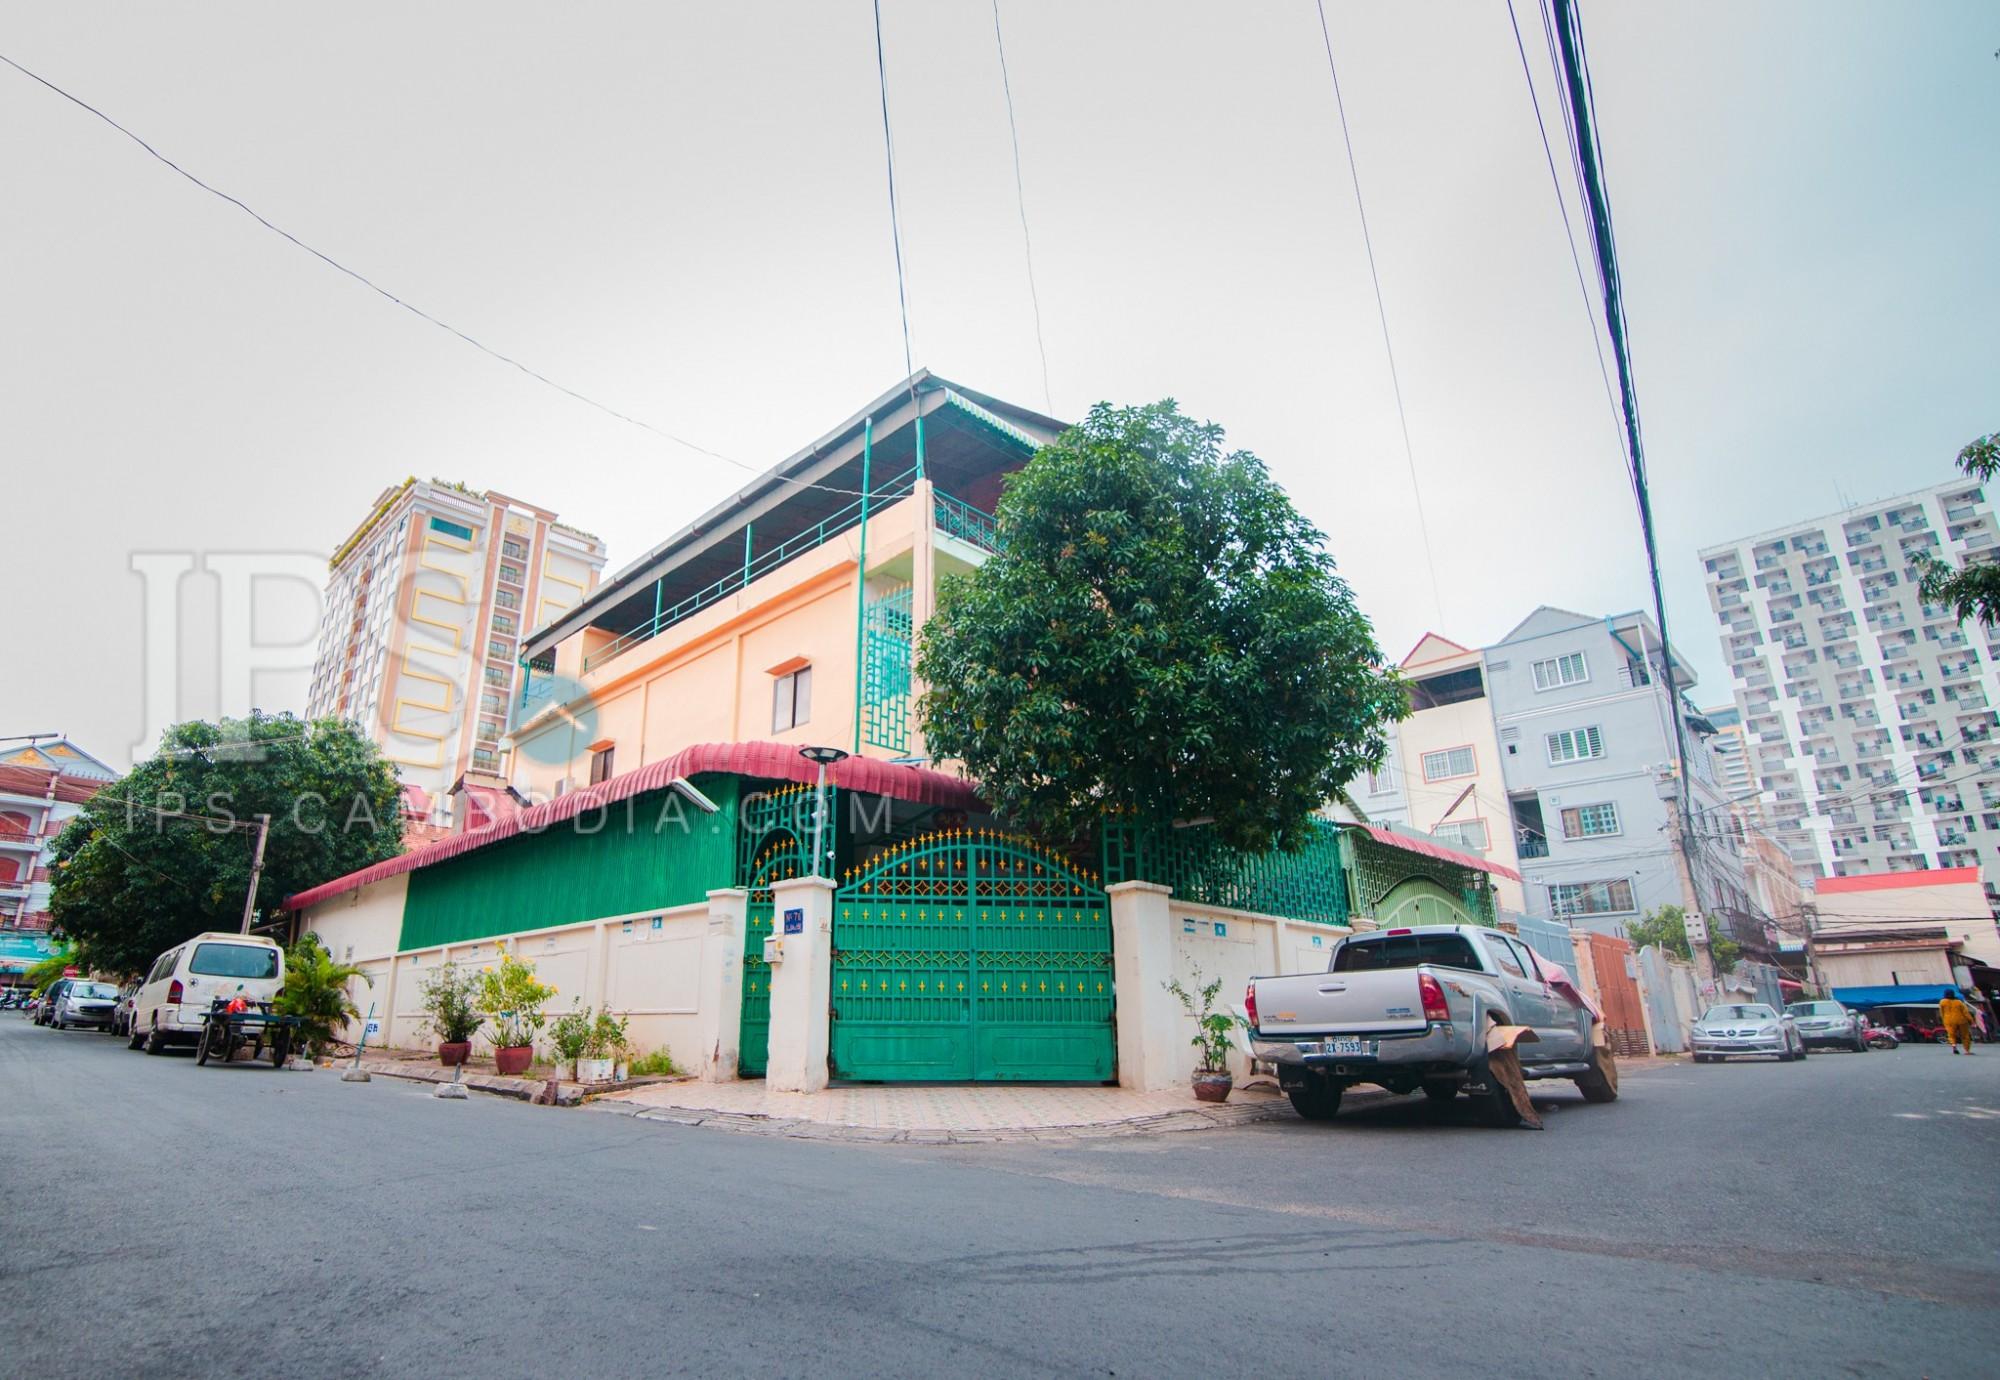 5 Bedroom Flat For Sale - Chamkarmorn, Phnom Penh